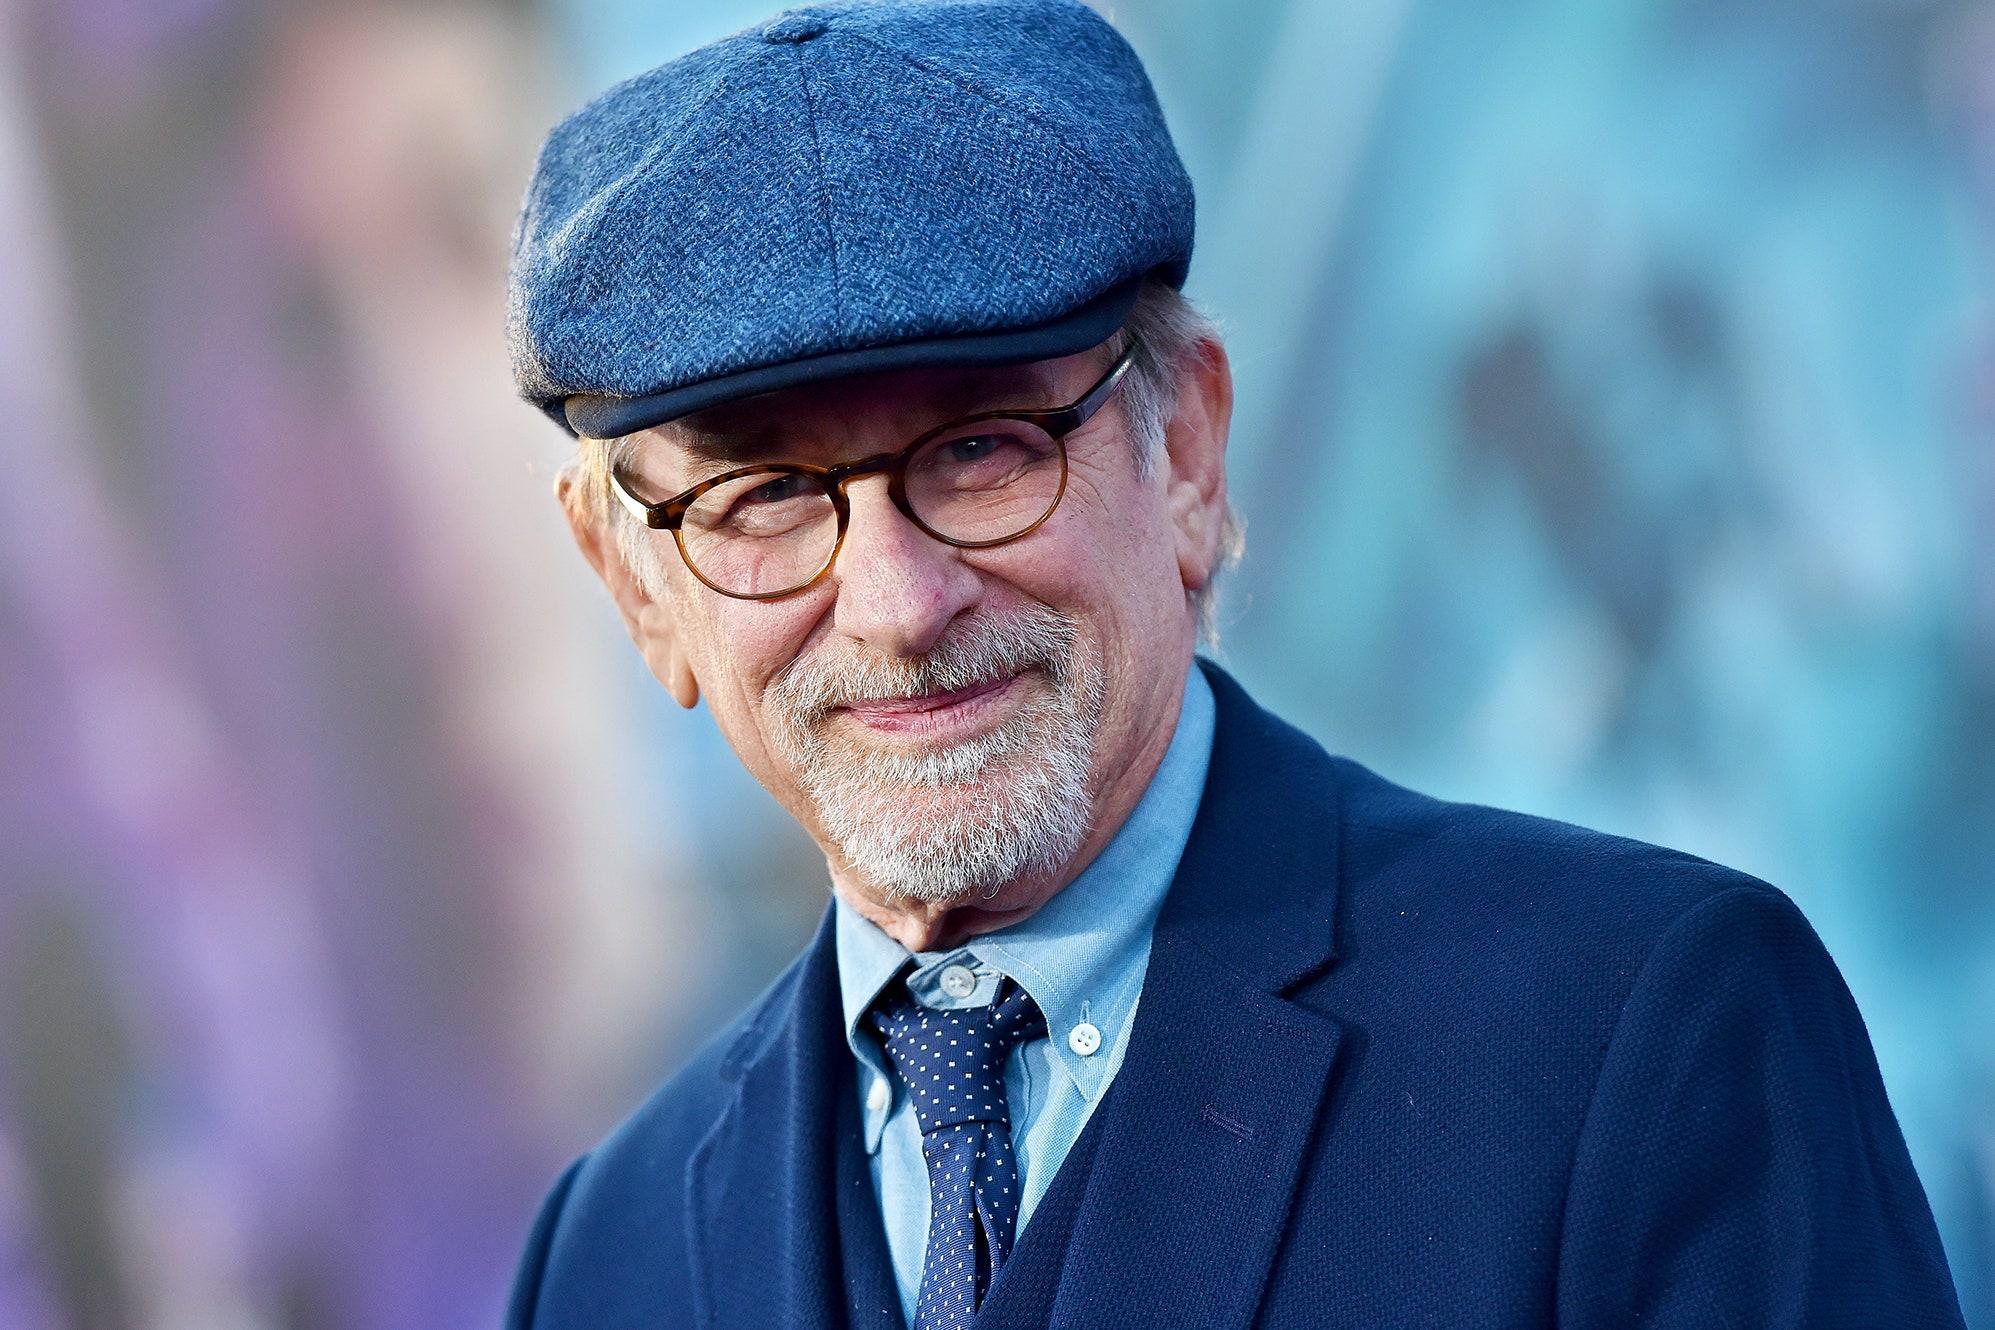 Foto do diretor Steven Spielberg